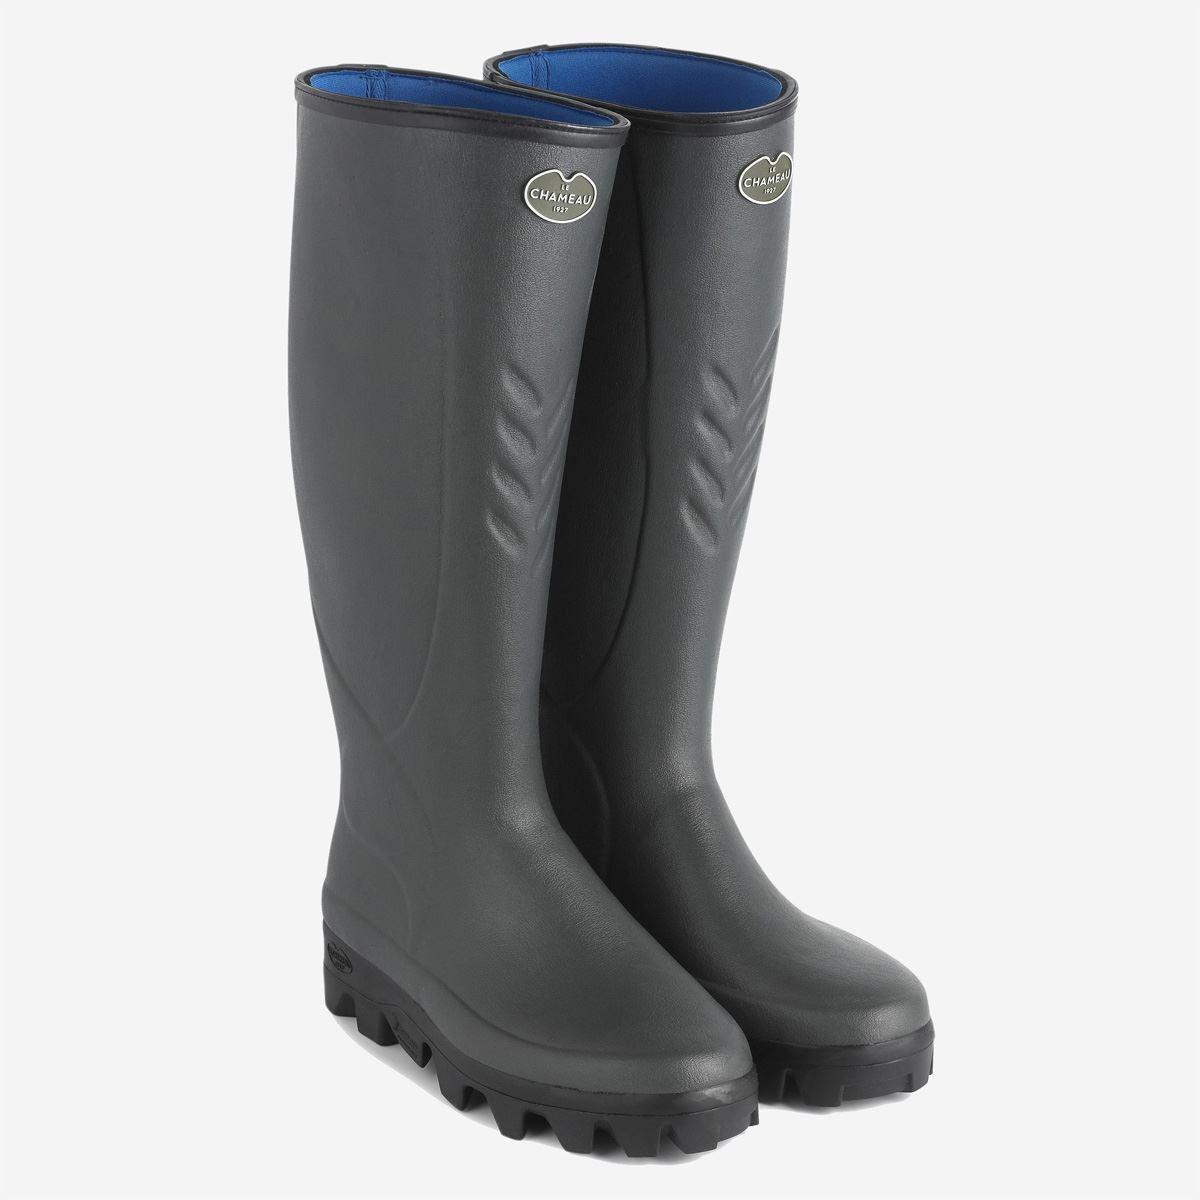 Le Chameau Ceres Neoprene Lined Wellington Boots